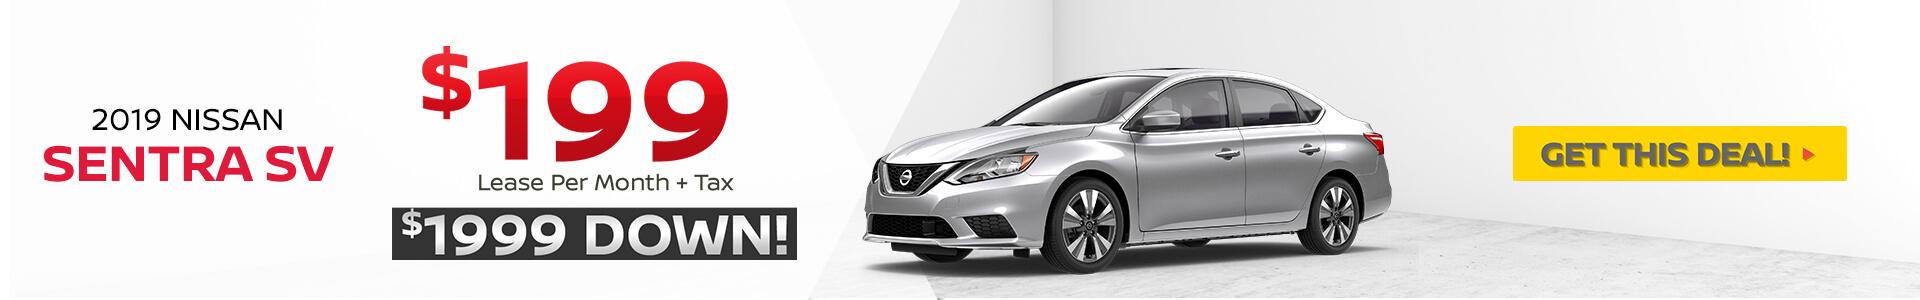 Nissan Sentra Lease $199